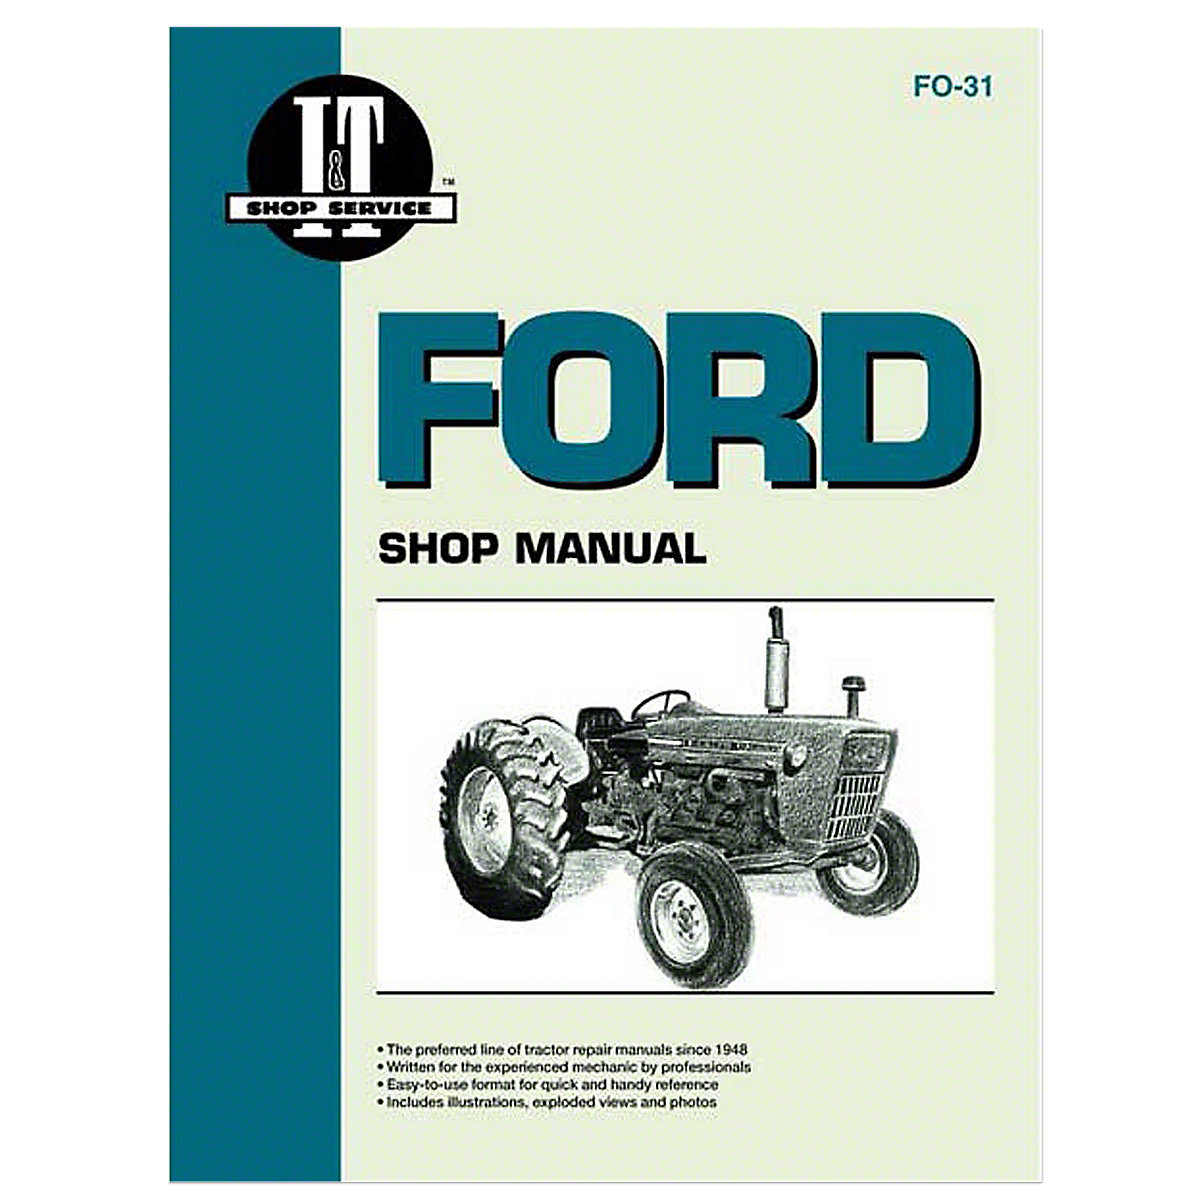 Dec451 8 Speed Trasmission Shift Patt Select O Ford 3000 Wiring Diagram I T Shop Service Manual